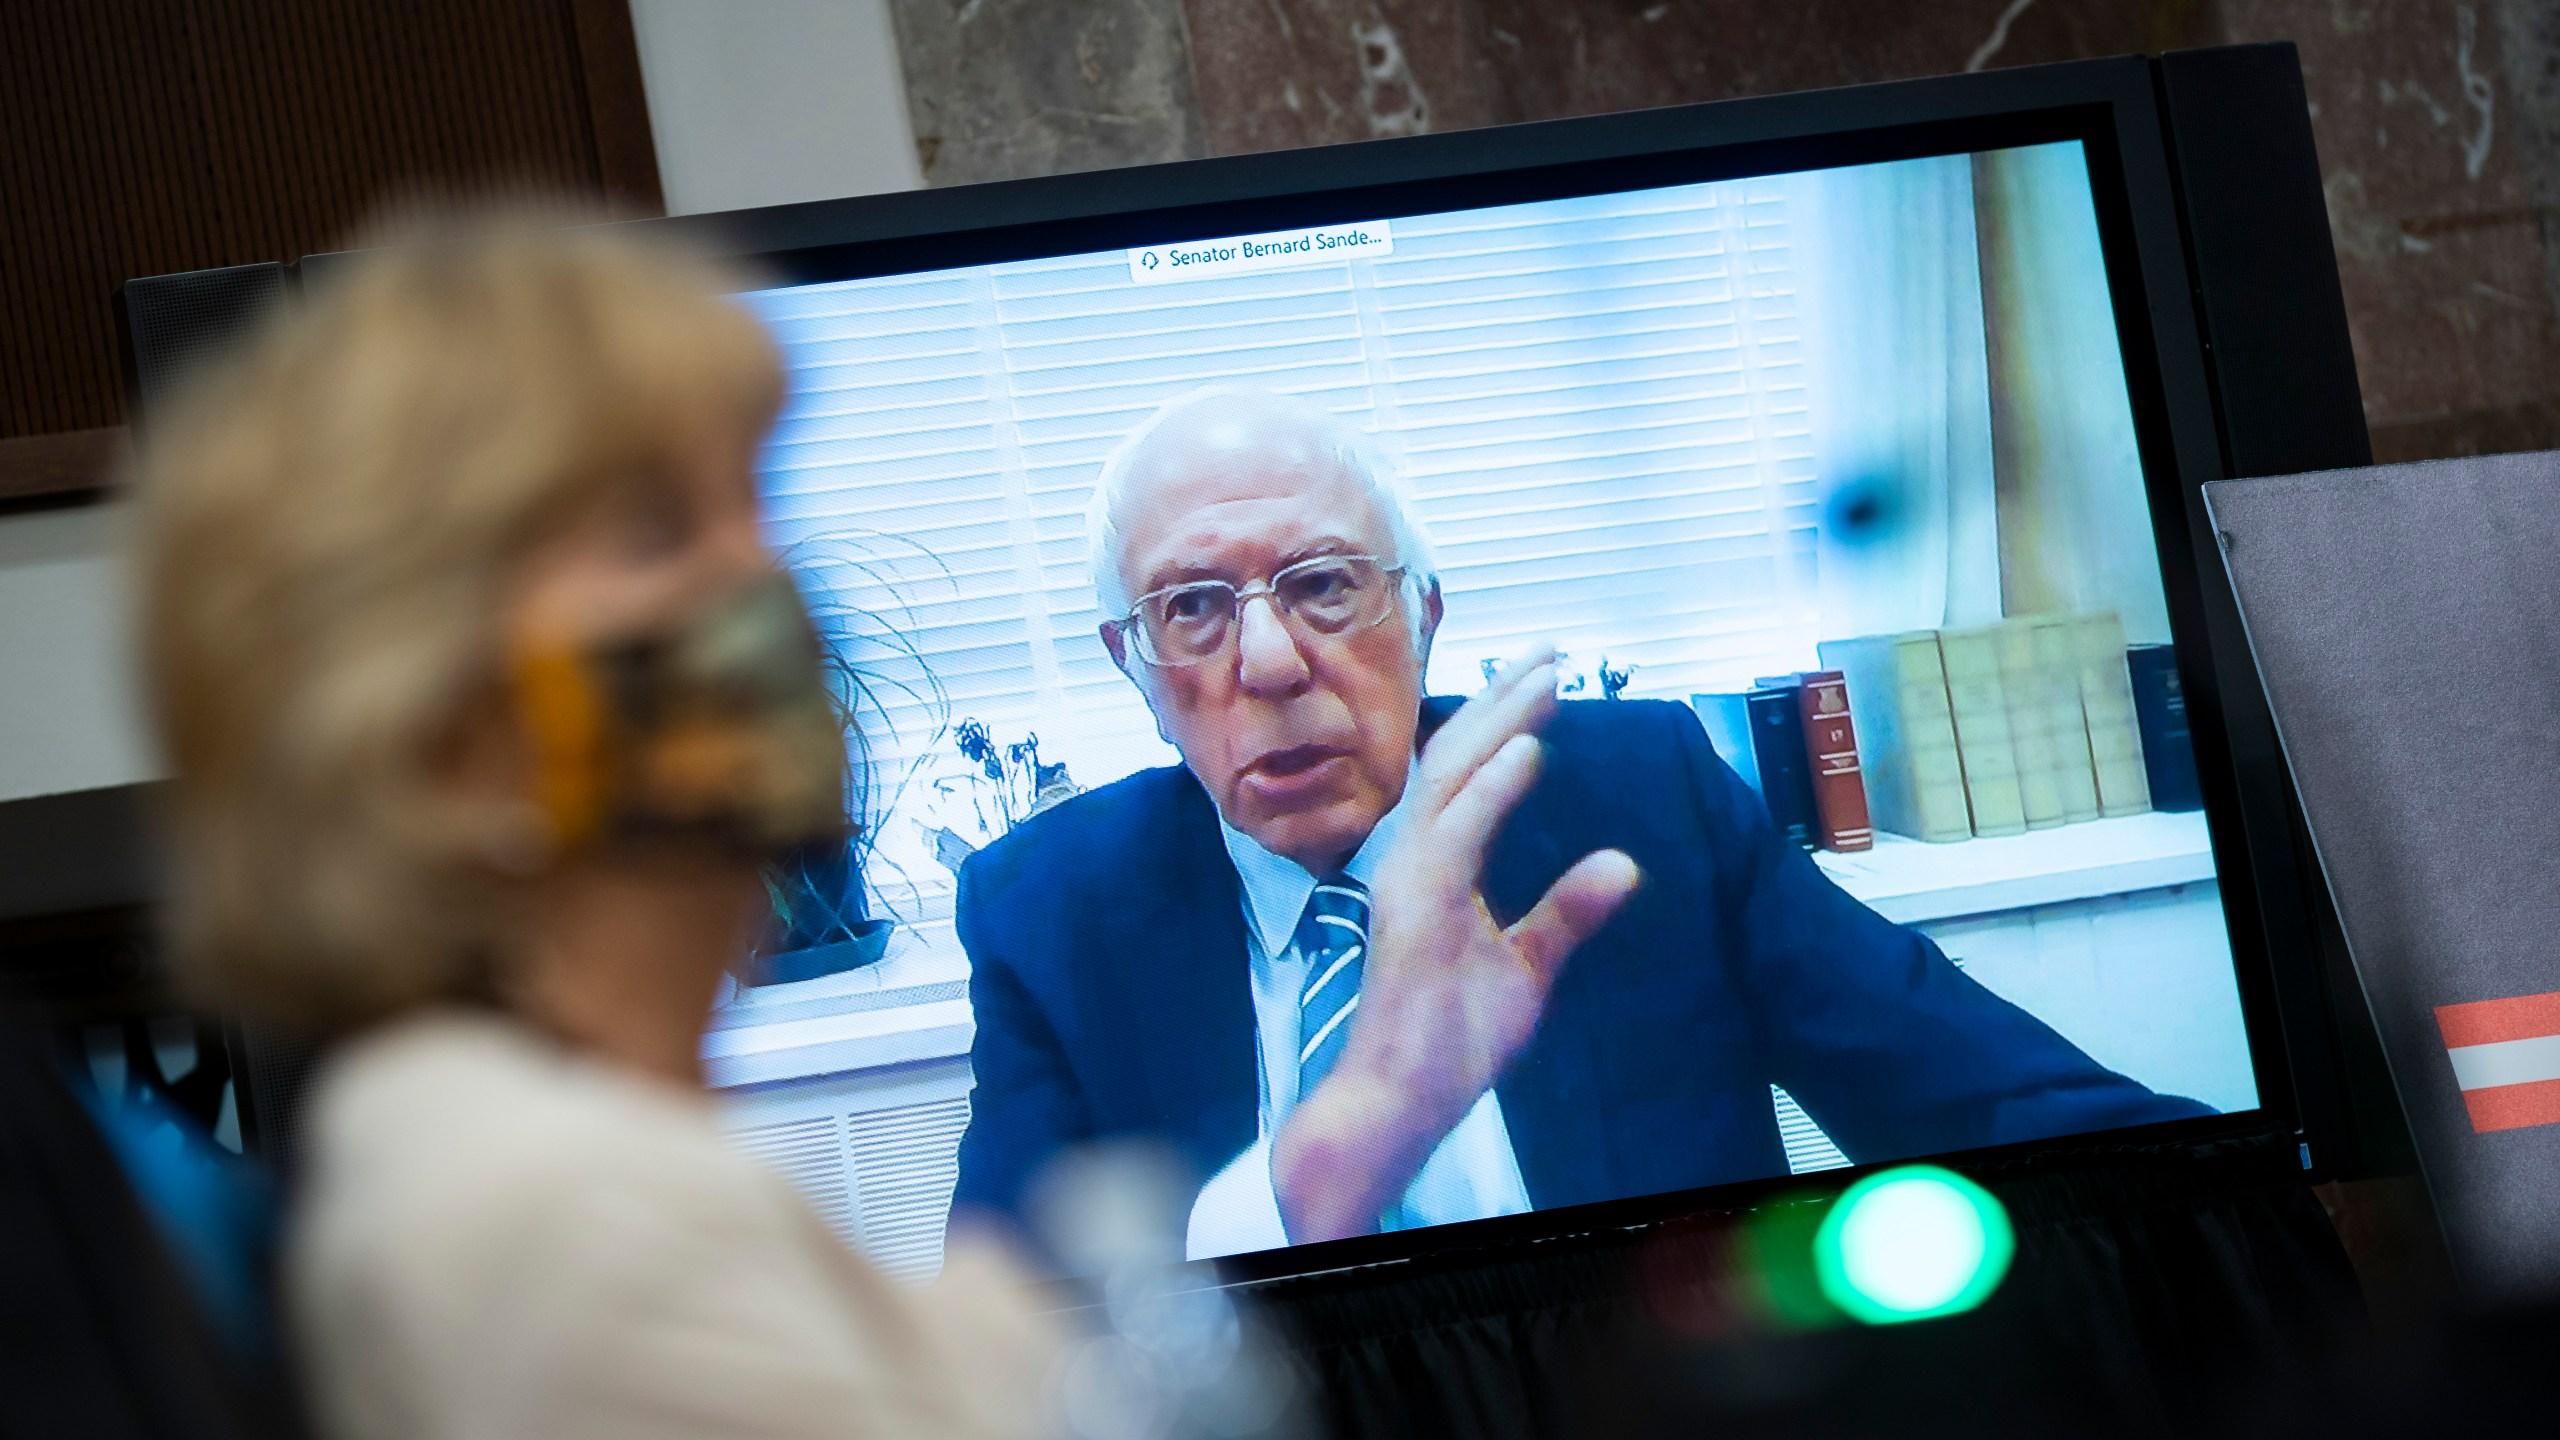 Sen. Bernie Sanders (I-VT) speaks via teleconference during a Senate Help Committee hearing on June 30, 2020, in Washington, DC. (Al Drago - Pool/Getty Images)